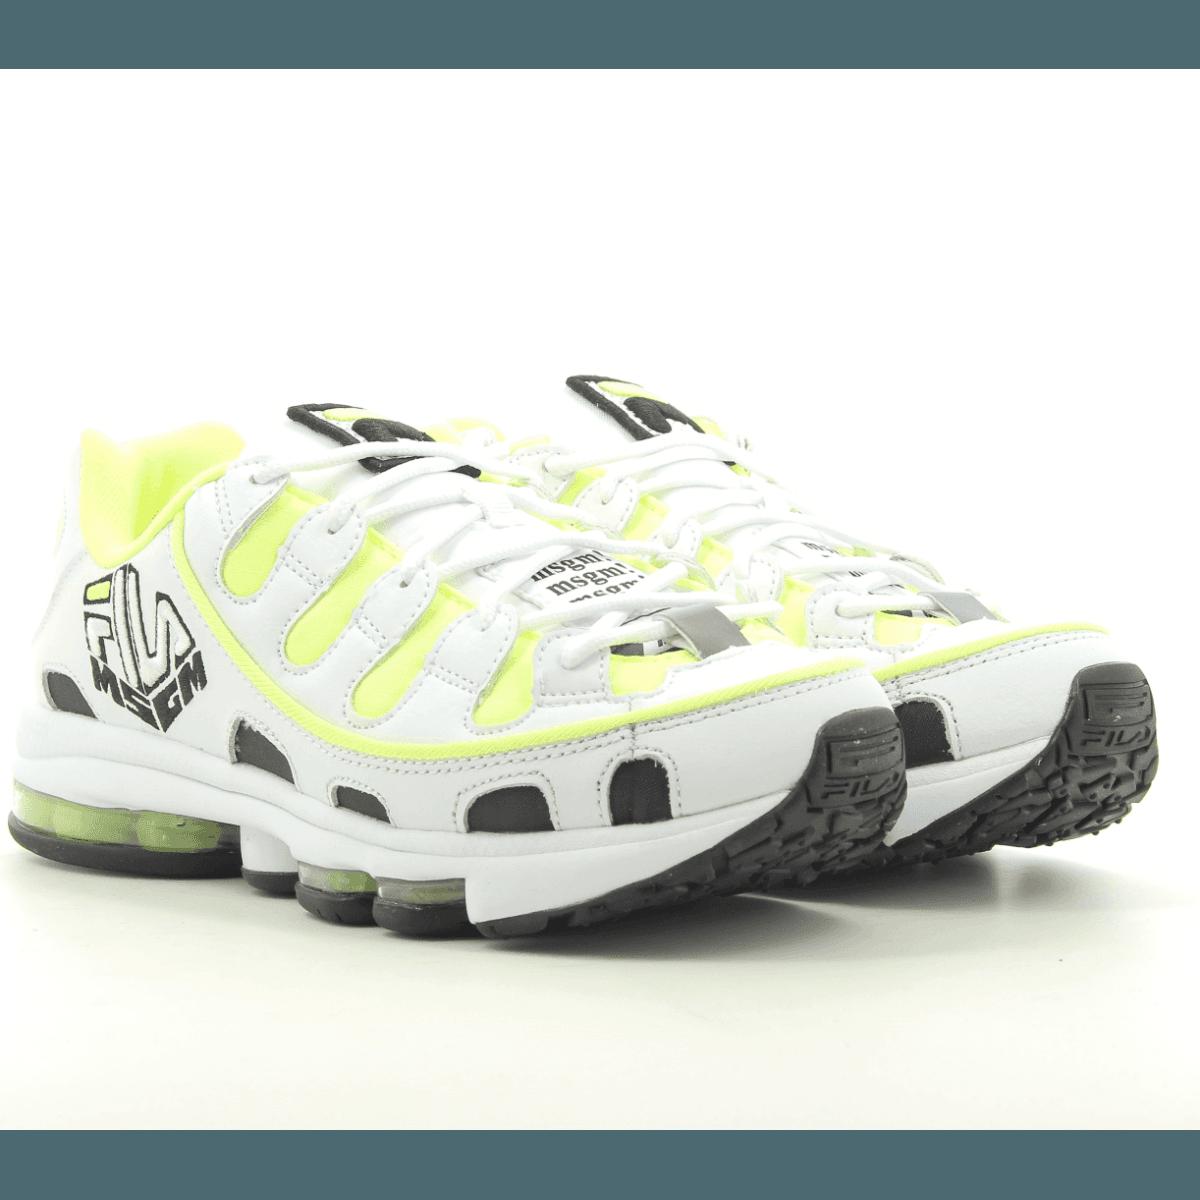 Sneakers blanches MSGM X FILA Silva for men - MSGM